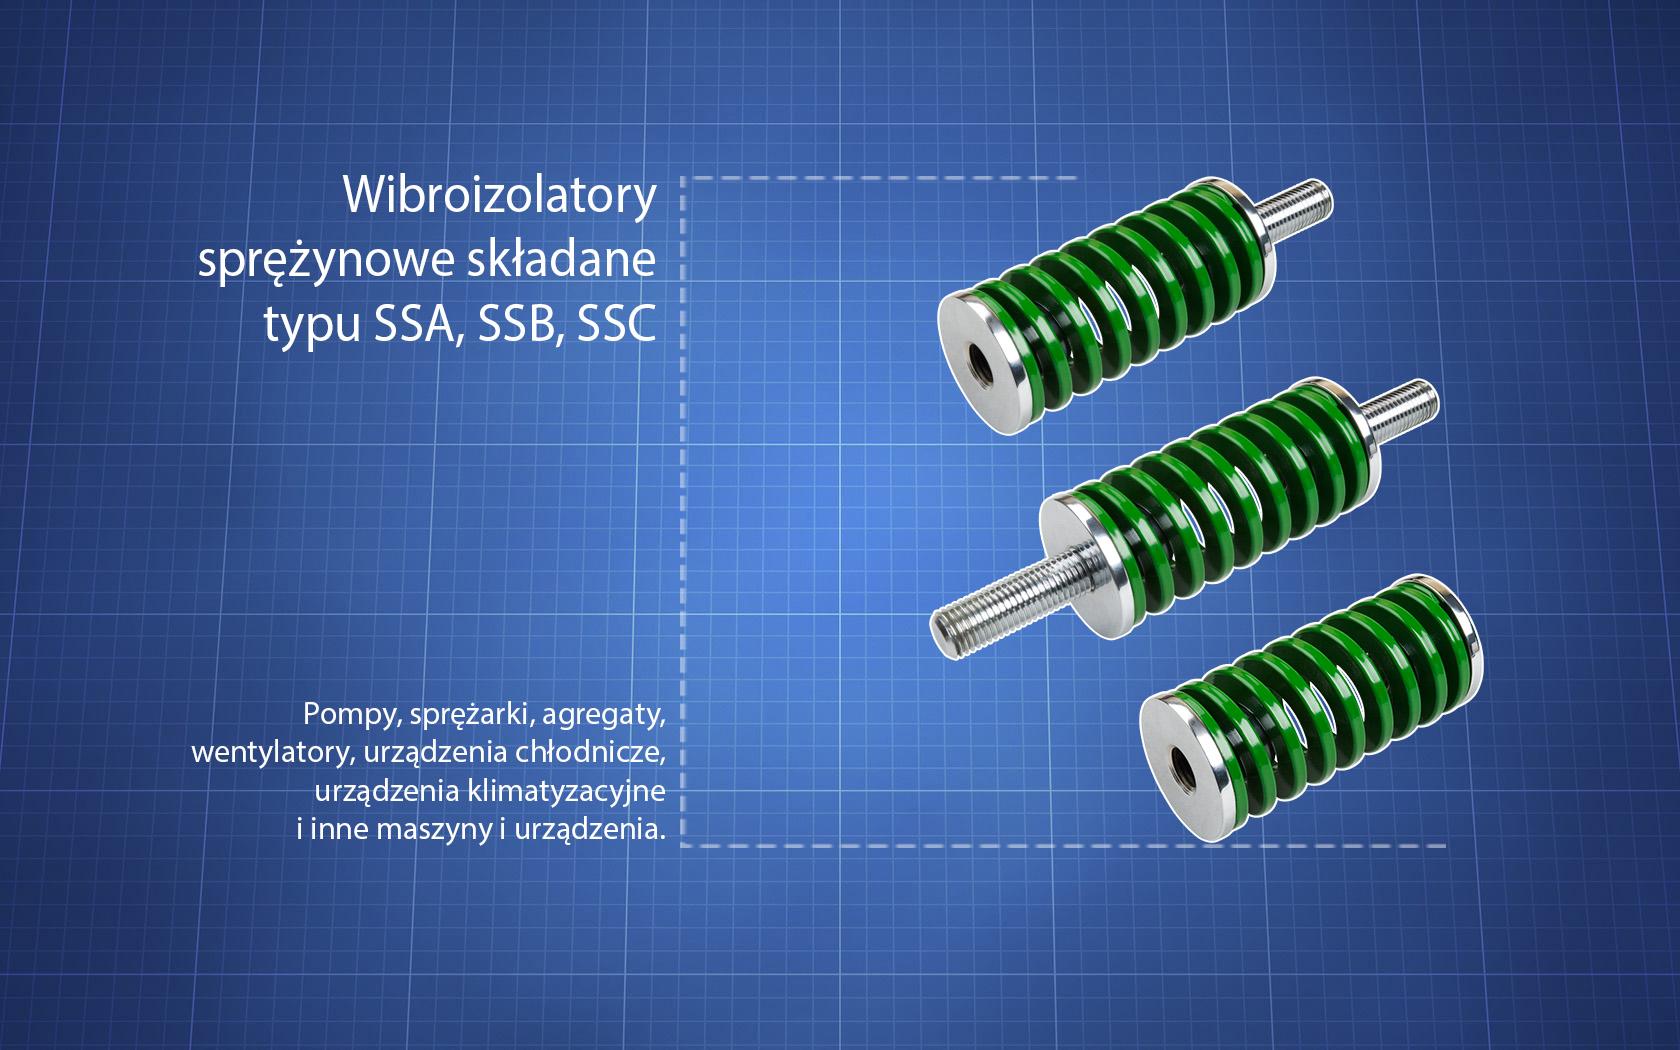 Wibroizolatory typu SSA, SSB i SSC